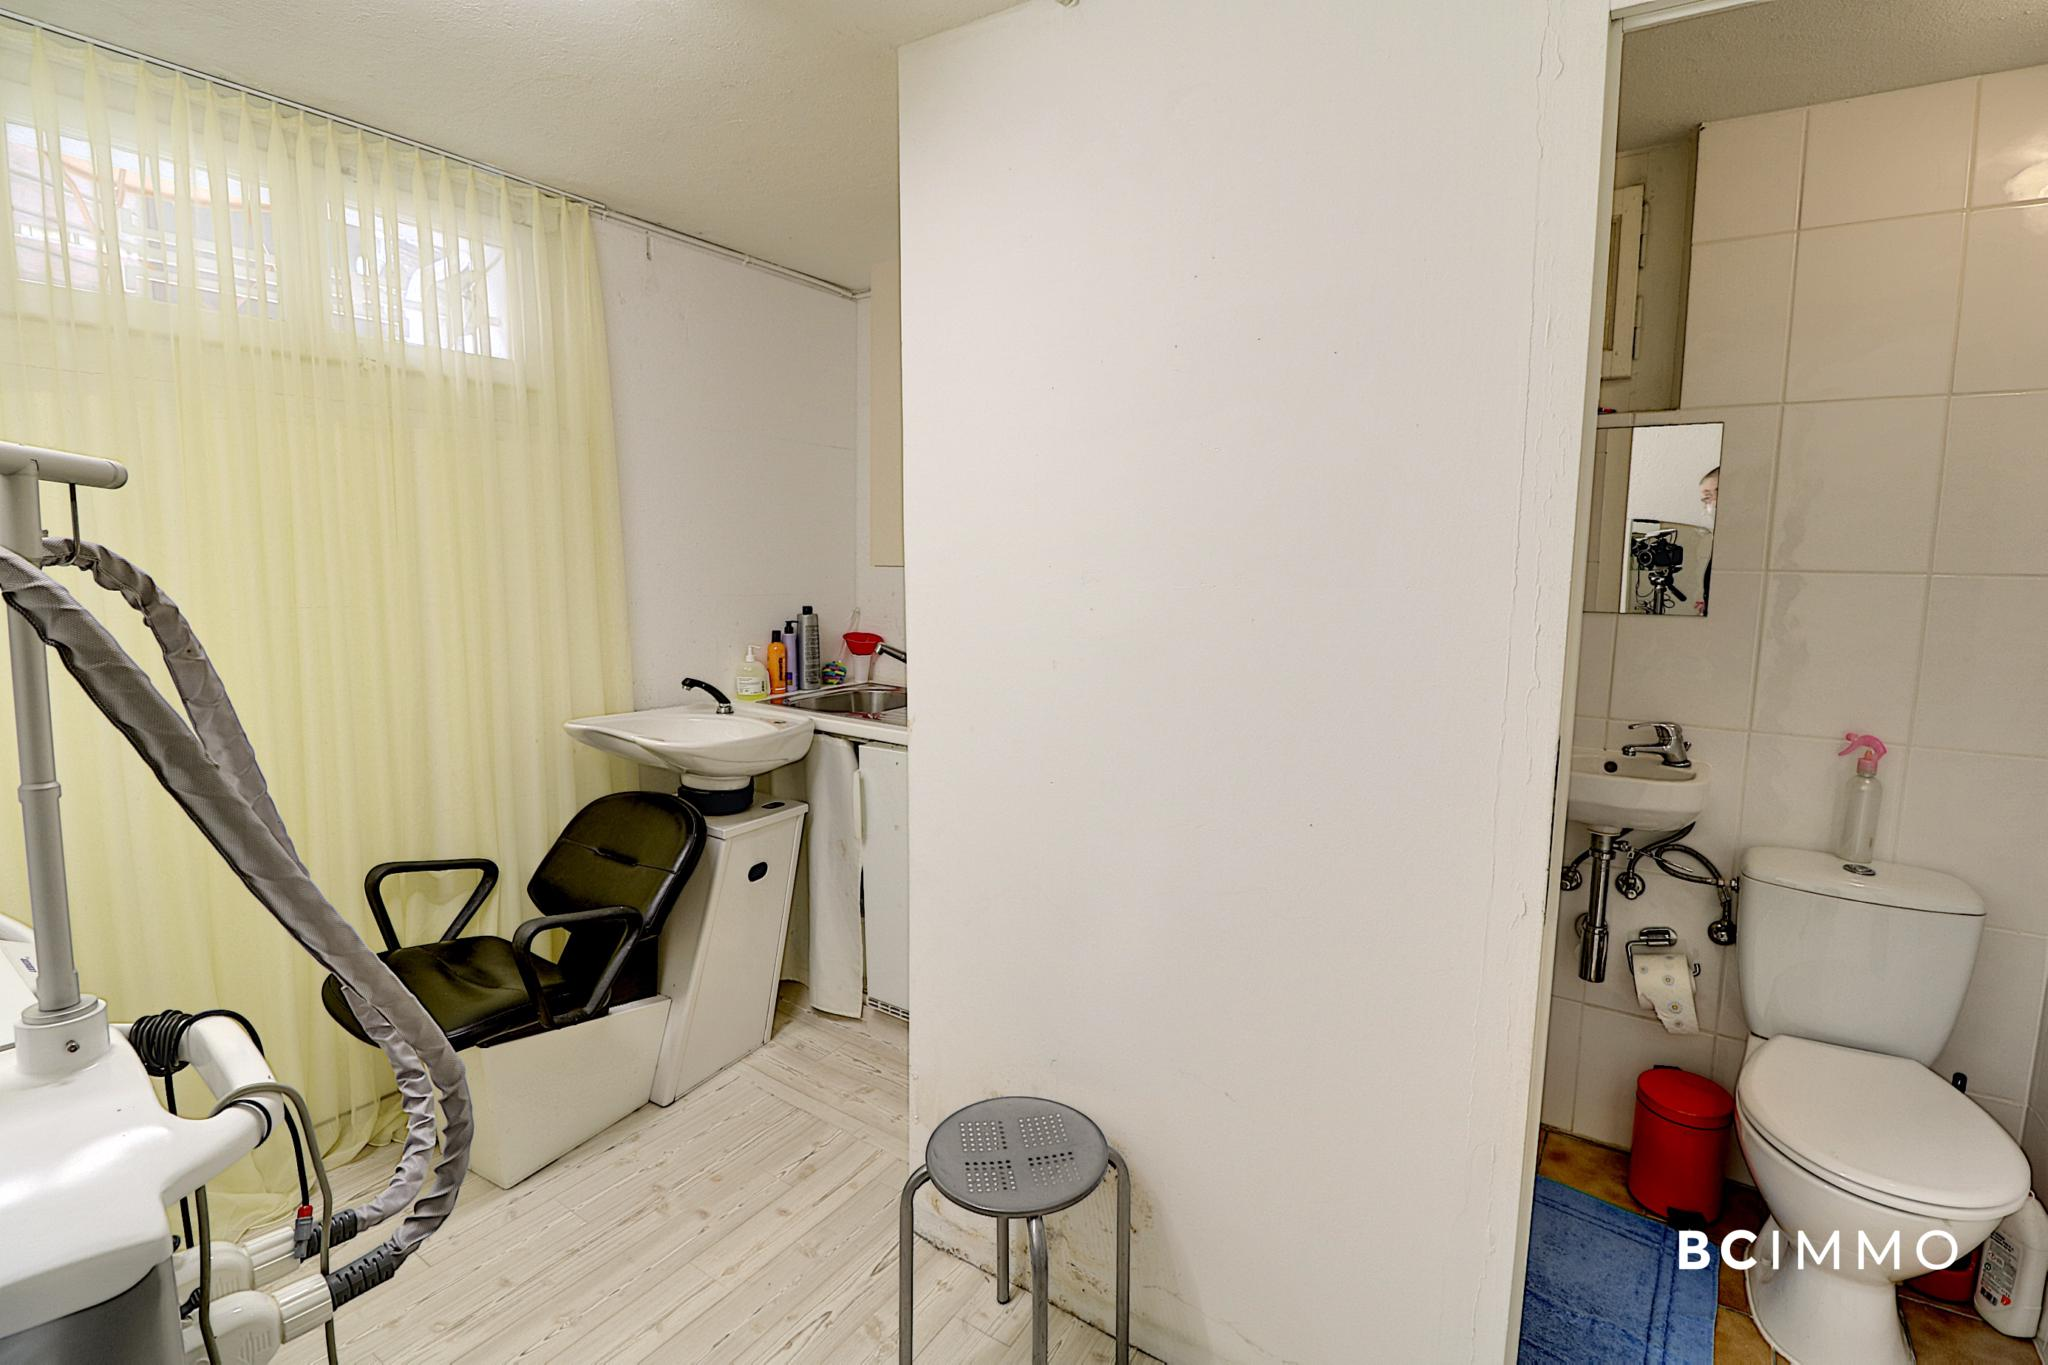 BC Immo - Immeuble Perraudettaz - 1009HBI211